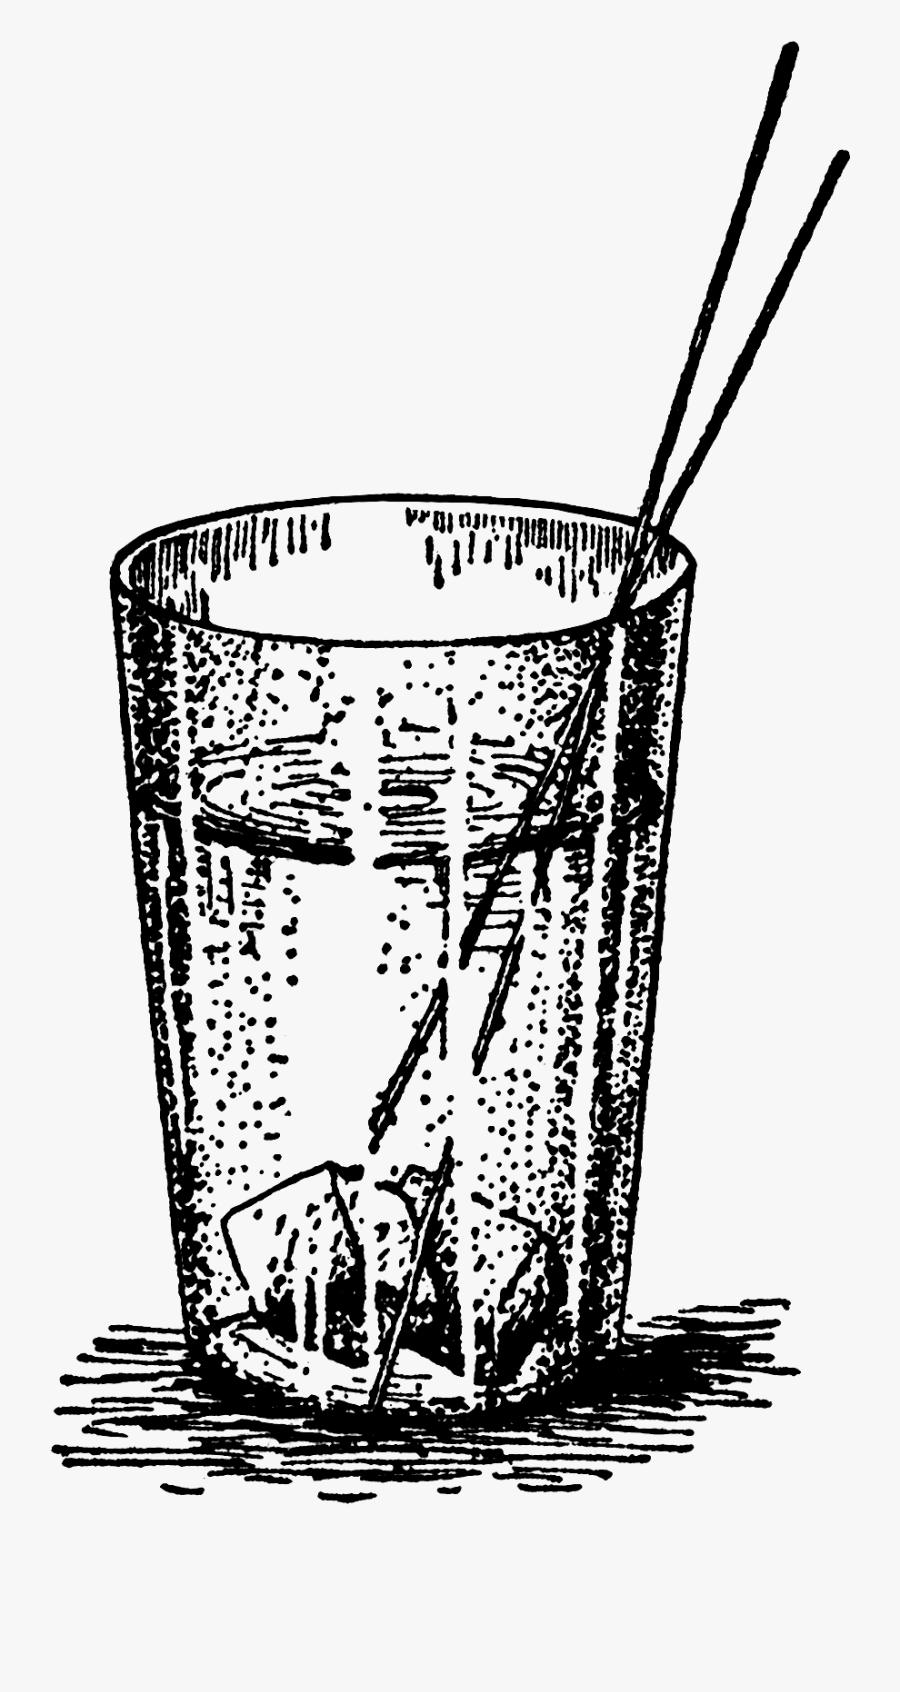 Transparent Vintage Milk Bottle Clipart - Glass Of Water Vintage Illustration, Transparent Clipart